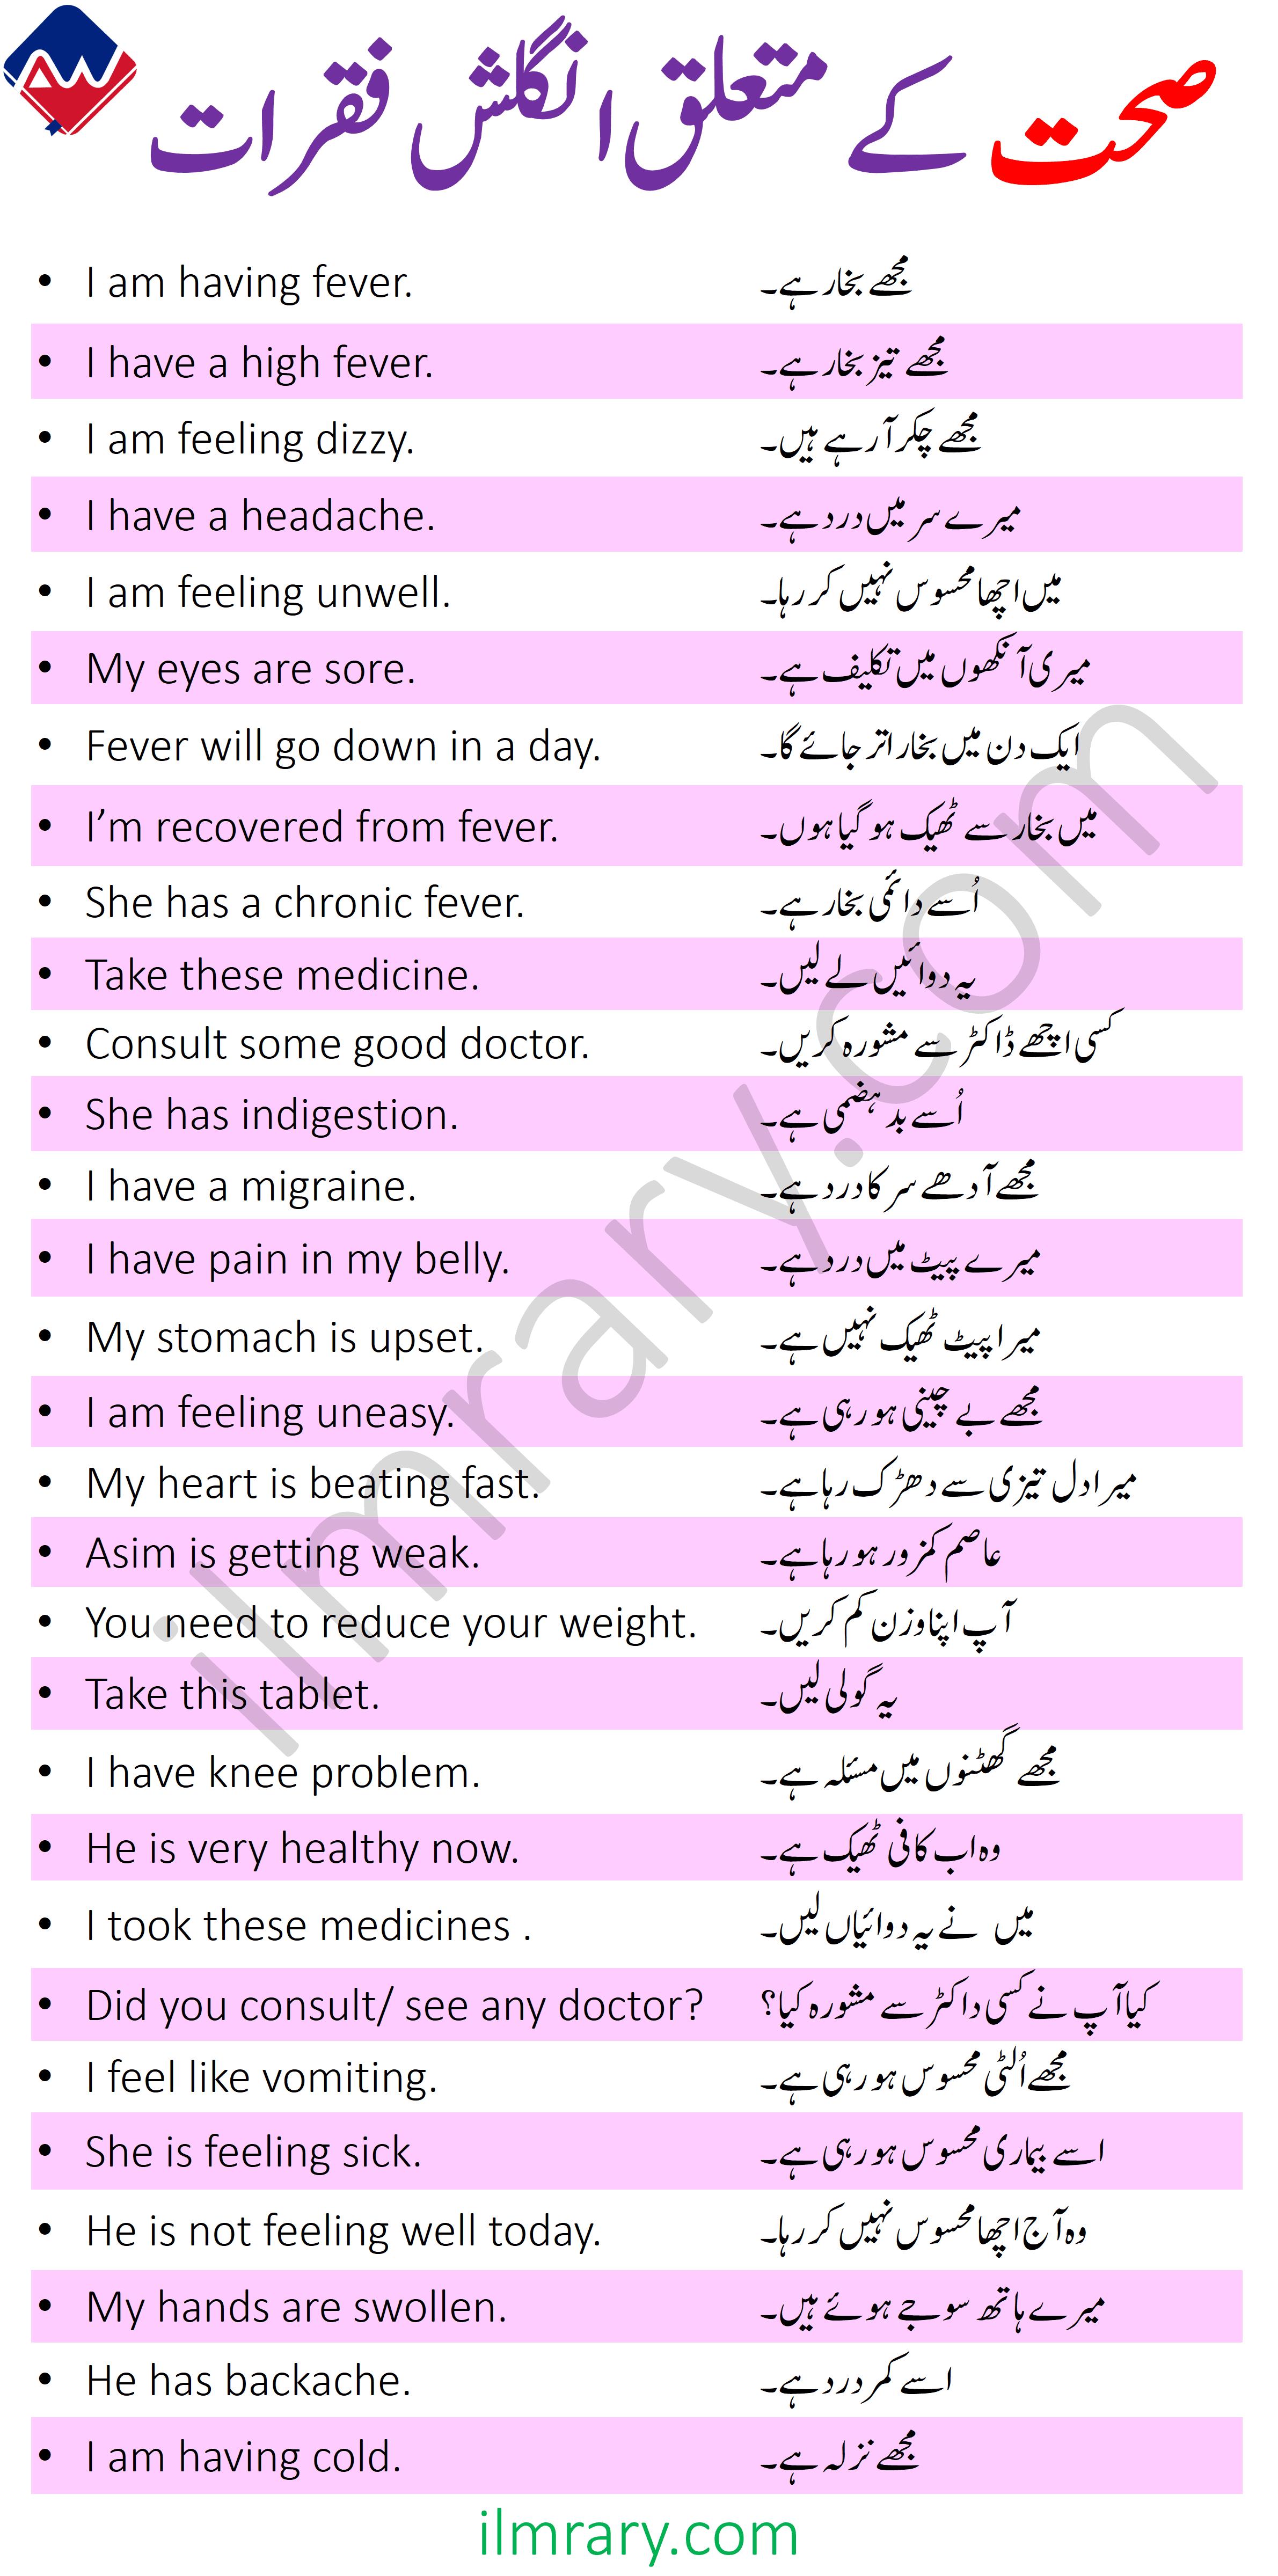 60 Health Related English Sentences with Urdu Translation